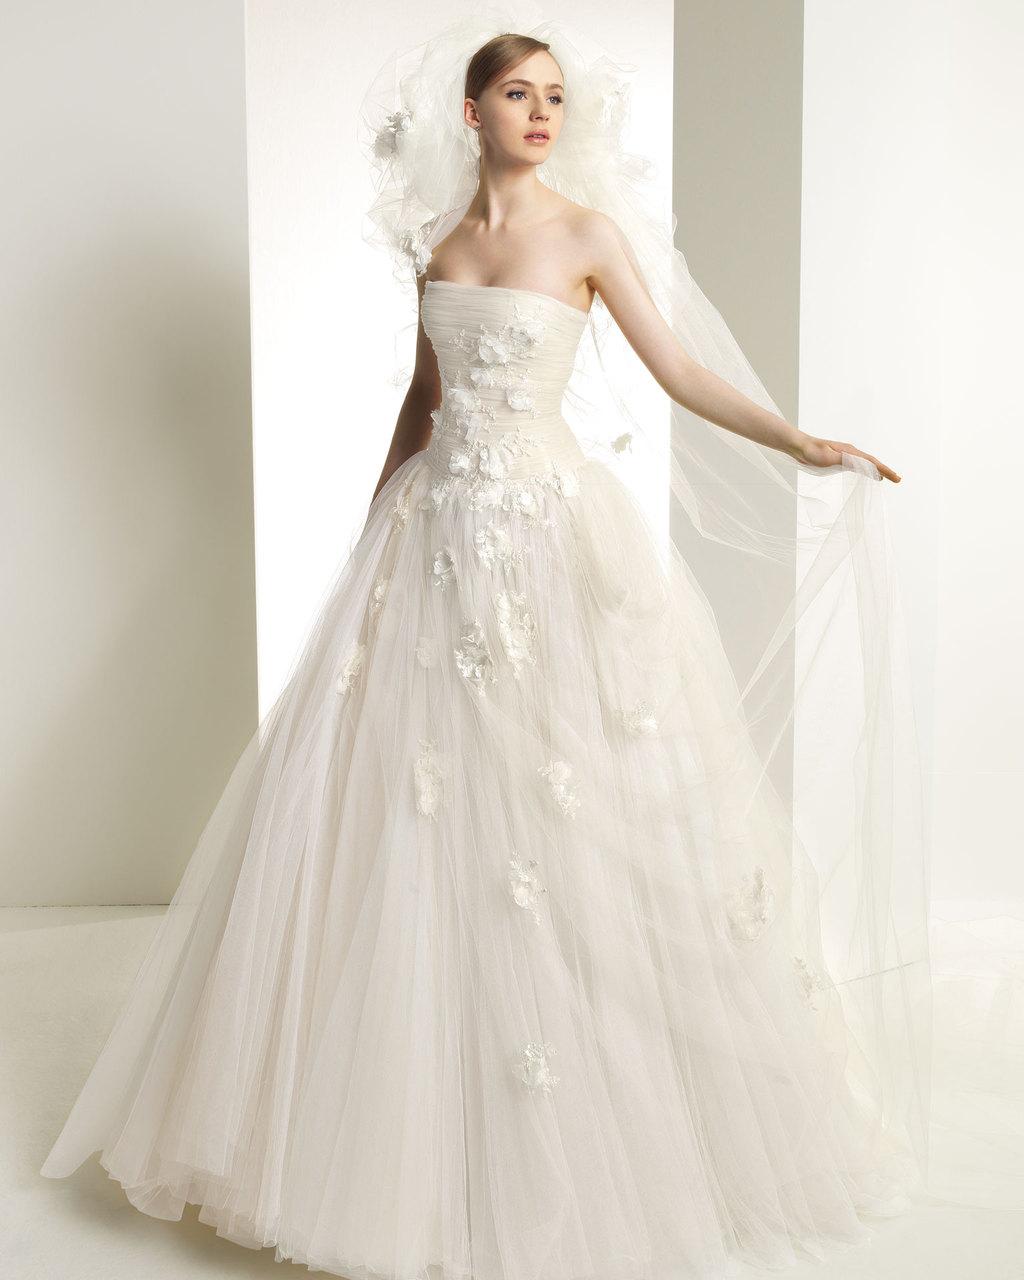 2013-wedding-dress-zuhair-murad-for-rosa-clara-bridal-gowns-107.full